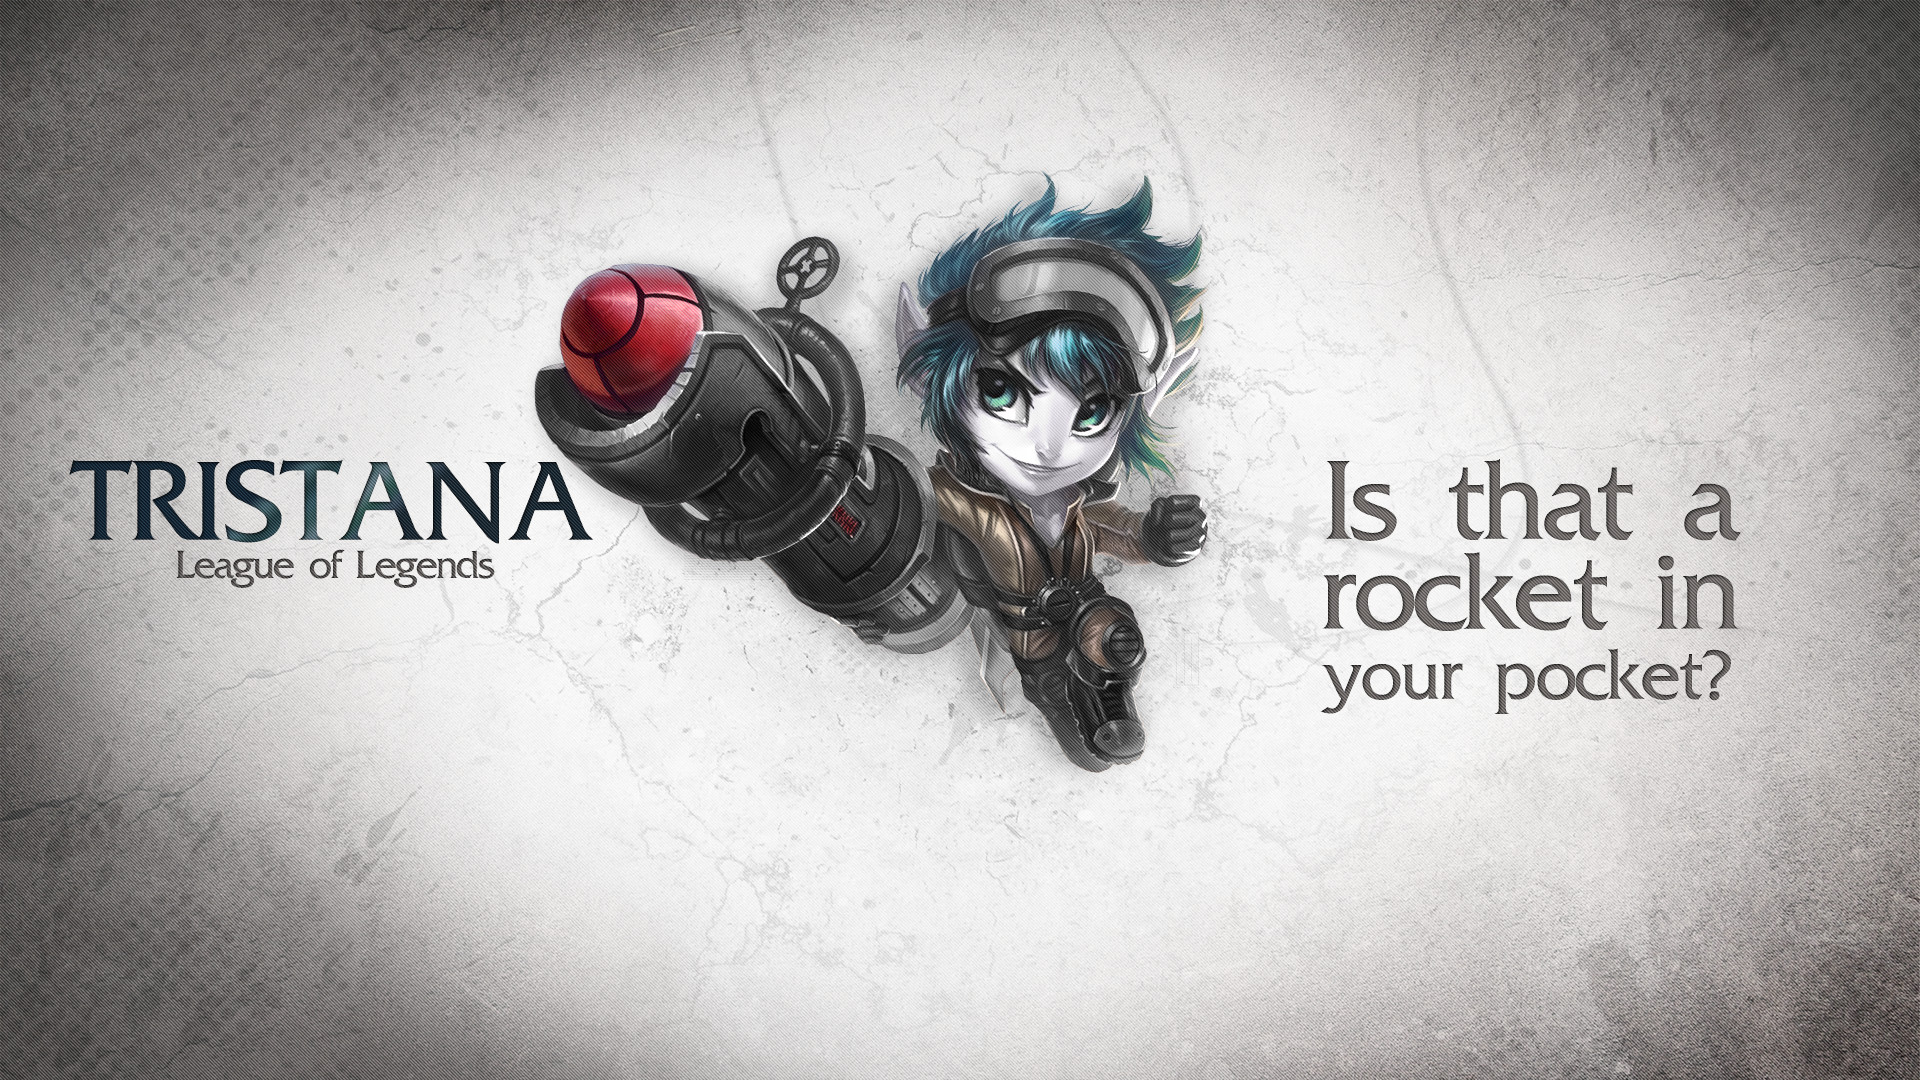 Video Game – League Of Legends Tristana (League Of Legends) Wallpaper